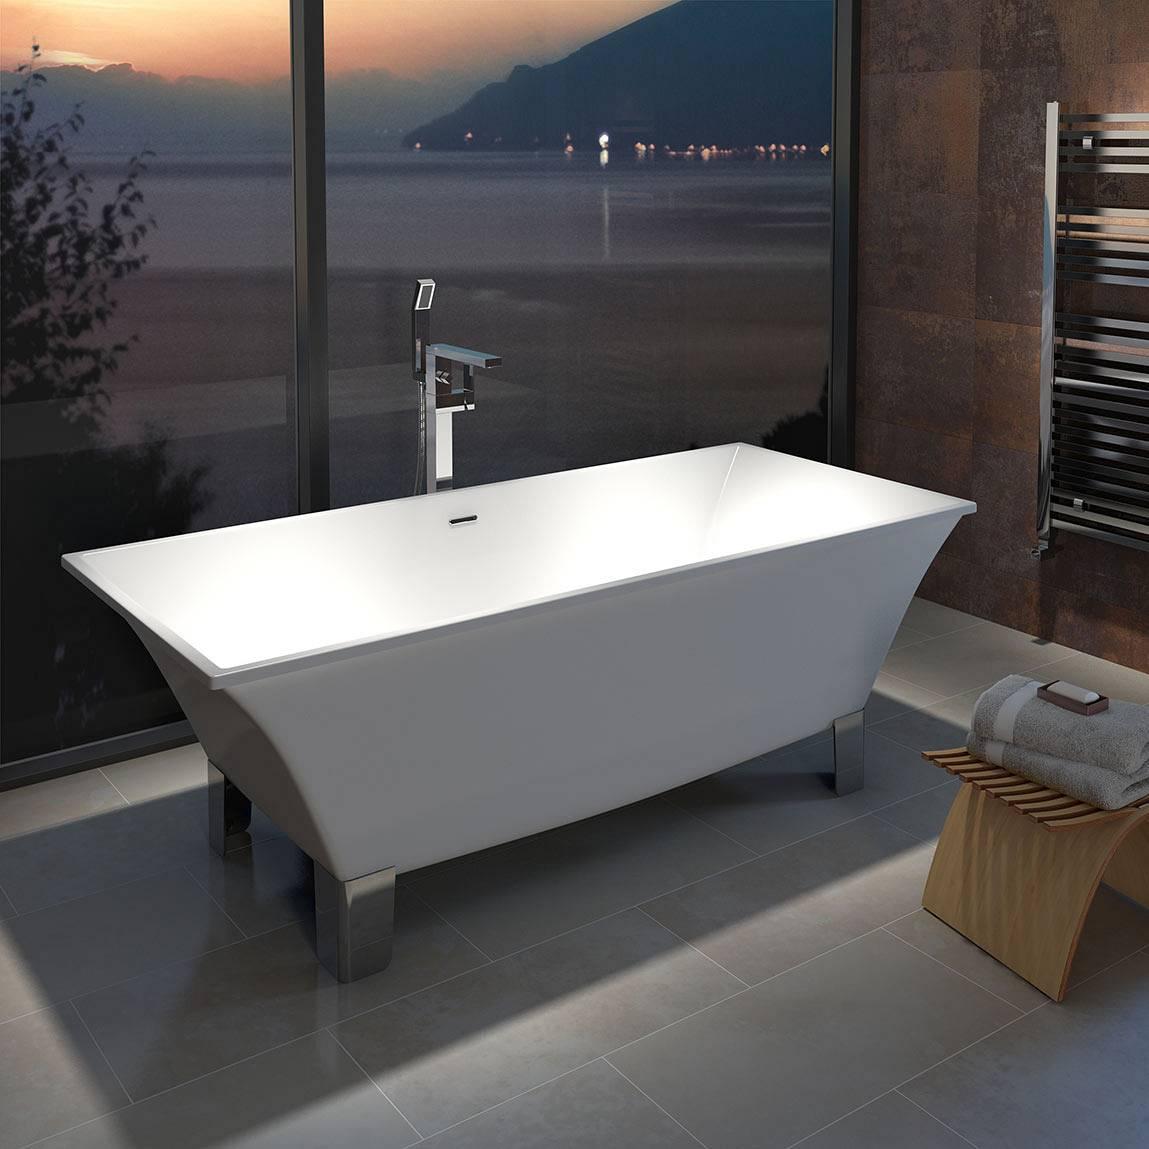 Ottowa Freestanding Bath